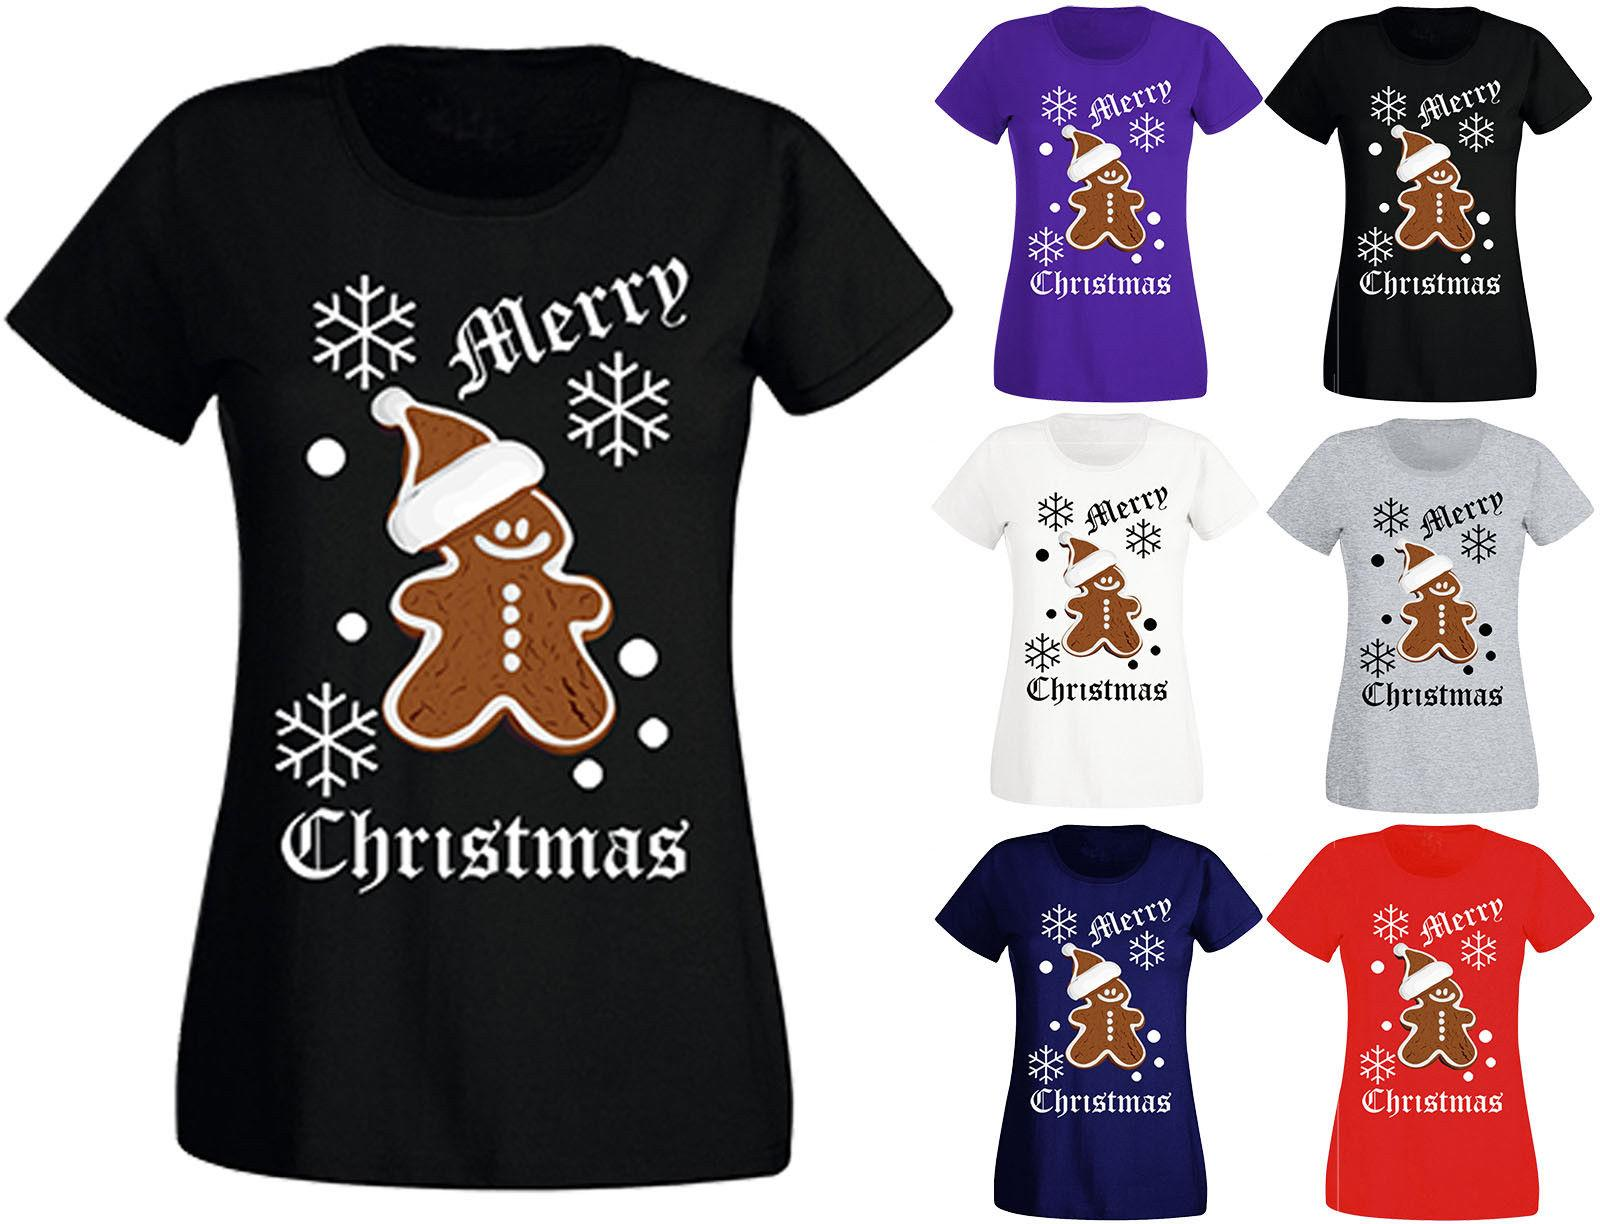 a94cefb0 New Womens Ladies Merry Christmas Gingerbread Man Festive Xmas T Shirt Top  6 18 Funny Unisex Casual Tee Gift Buy Tshirts The Who T Shirts From  Tshirtsinc, ...